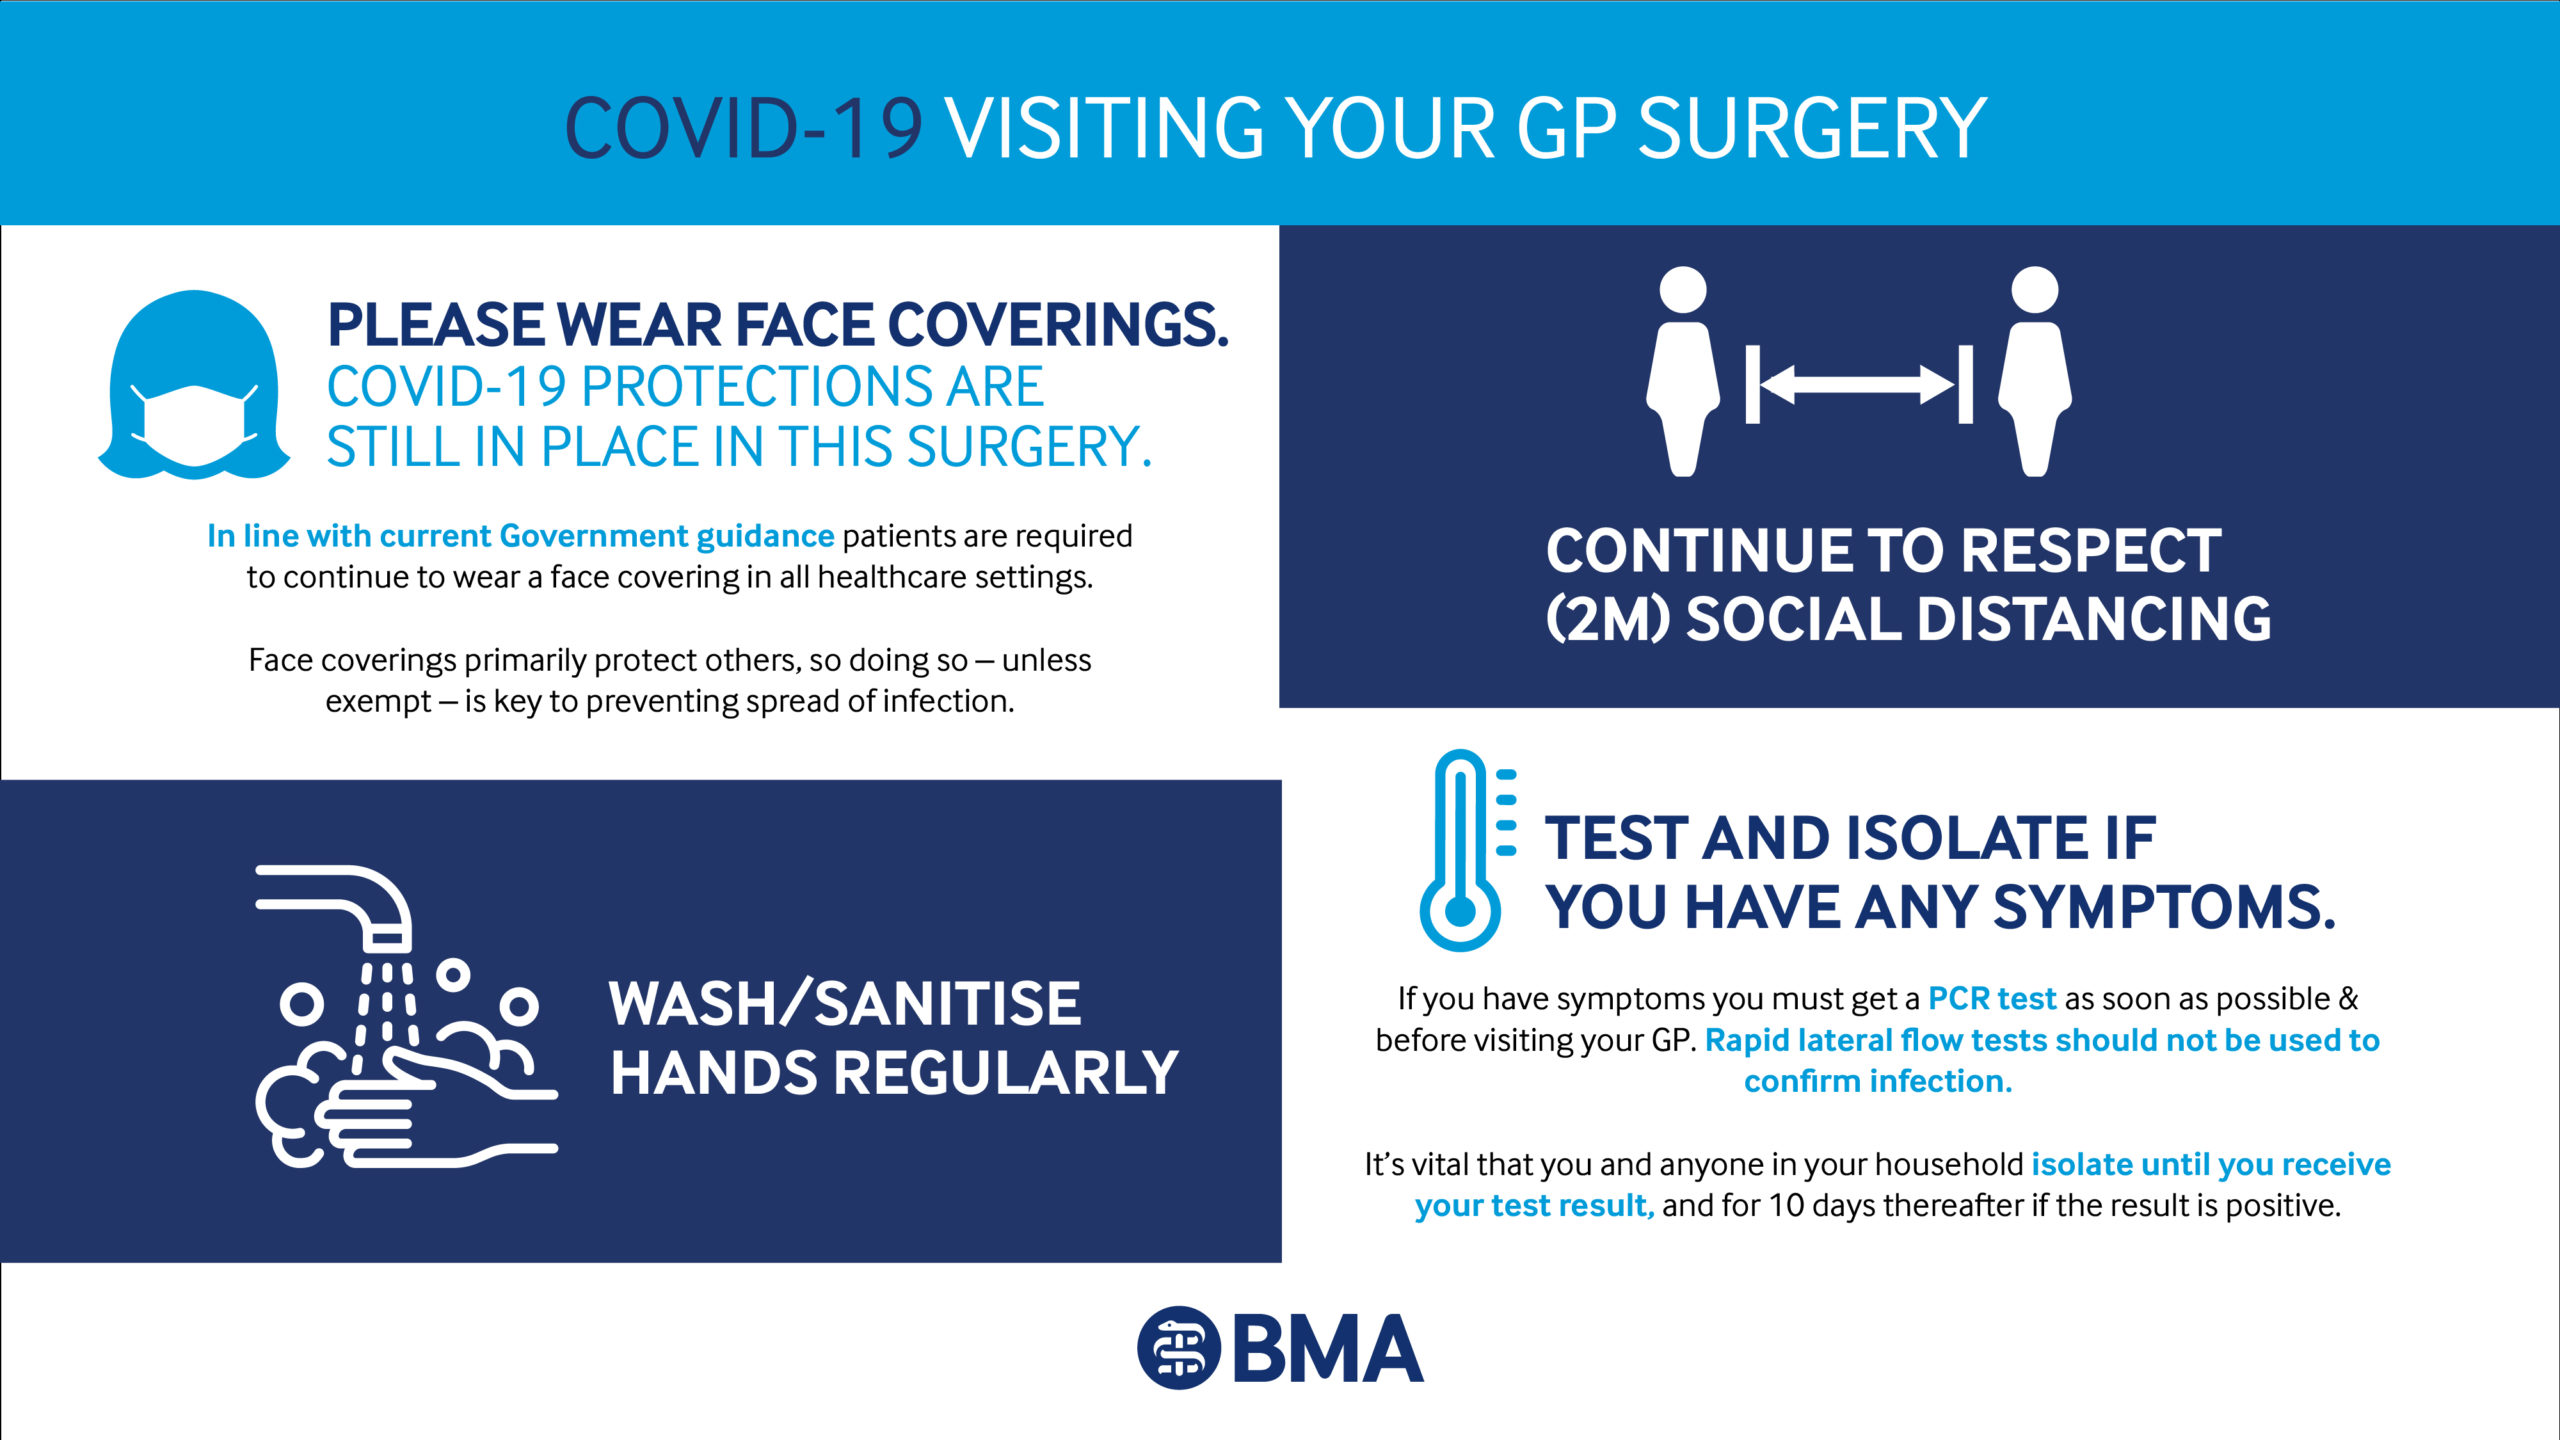 banner regarding visiting your local gp surgery